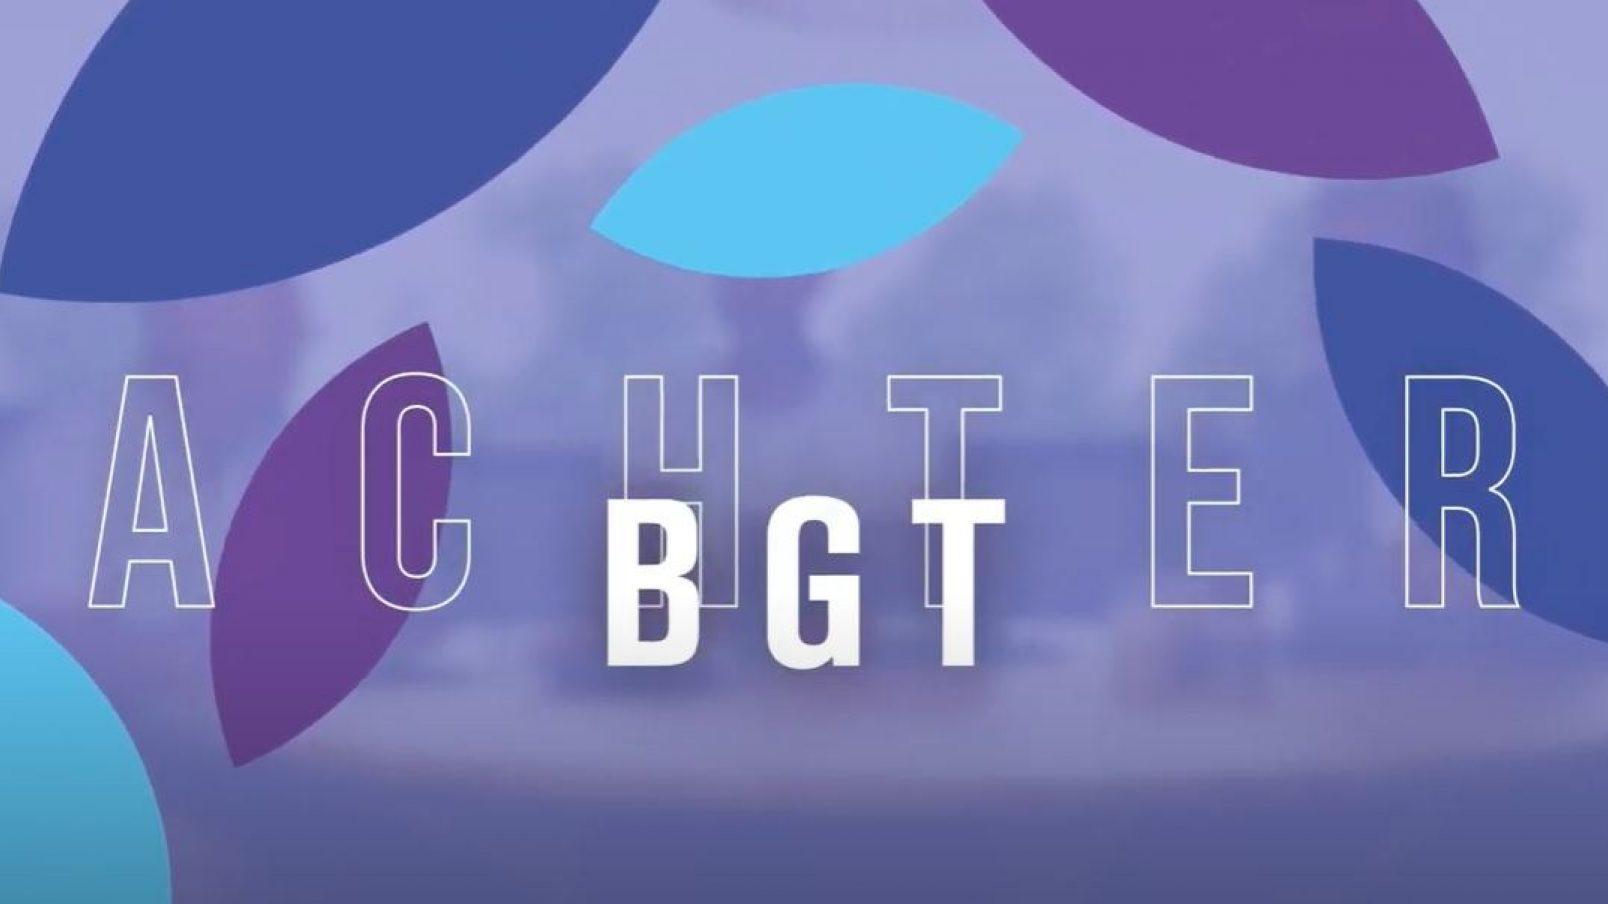 'Achter BGT' is bij Stayble